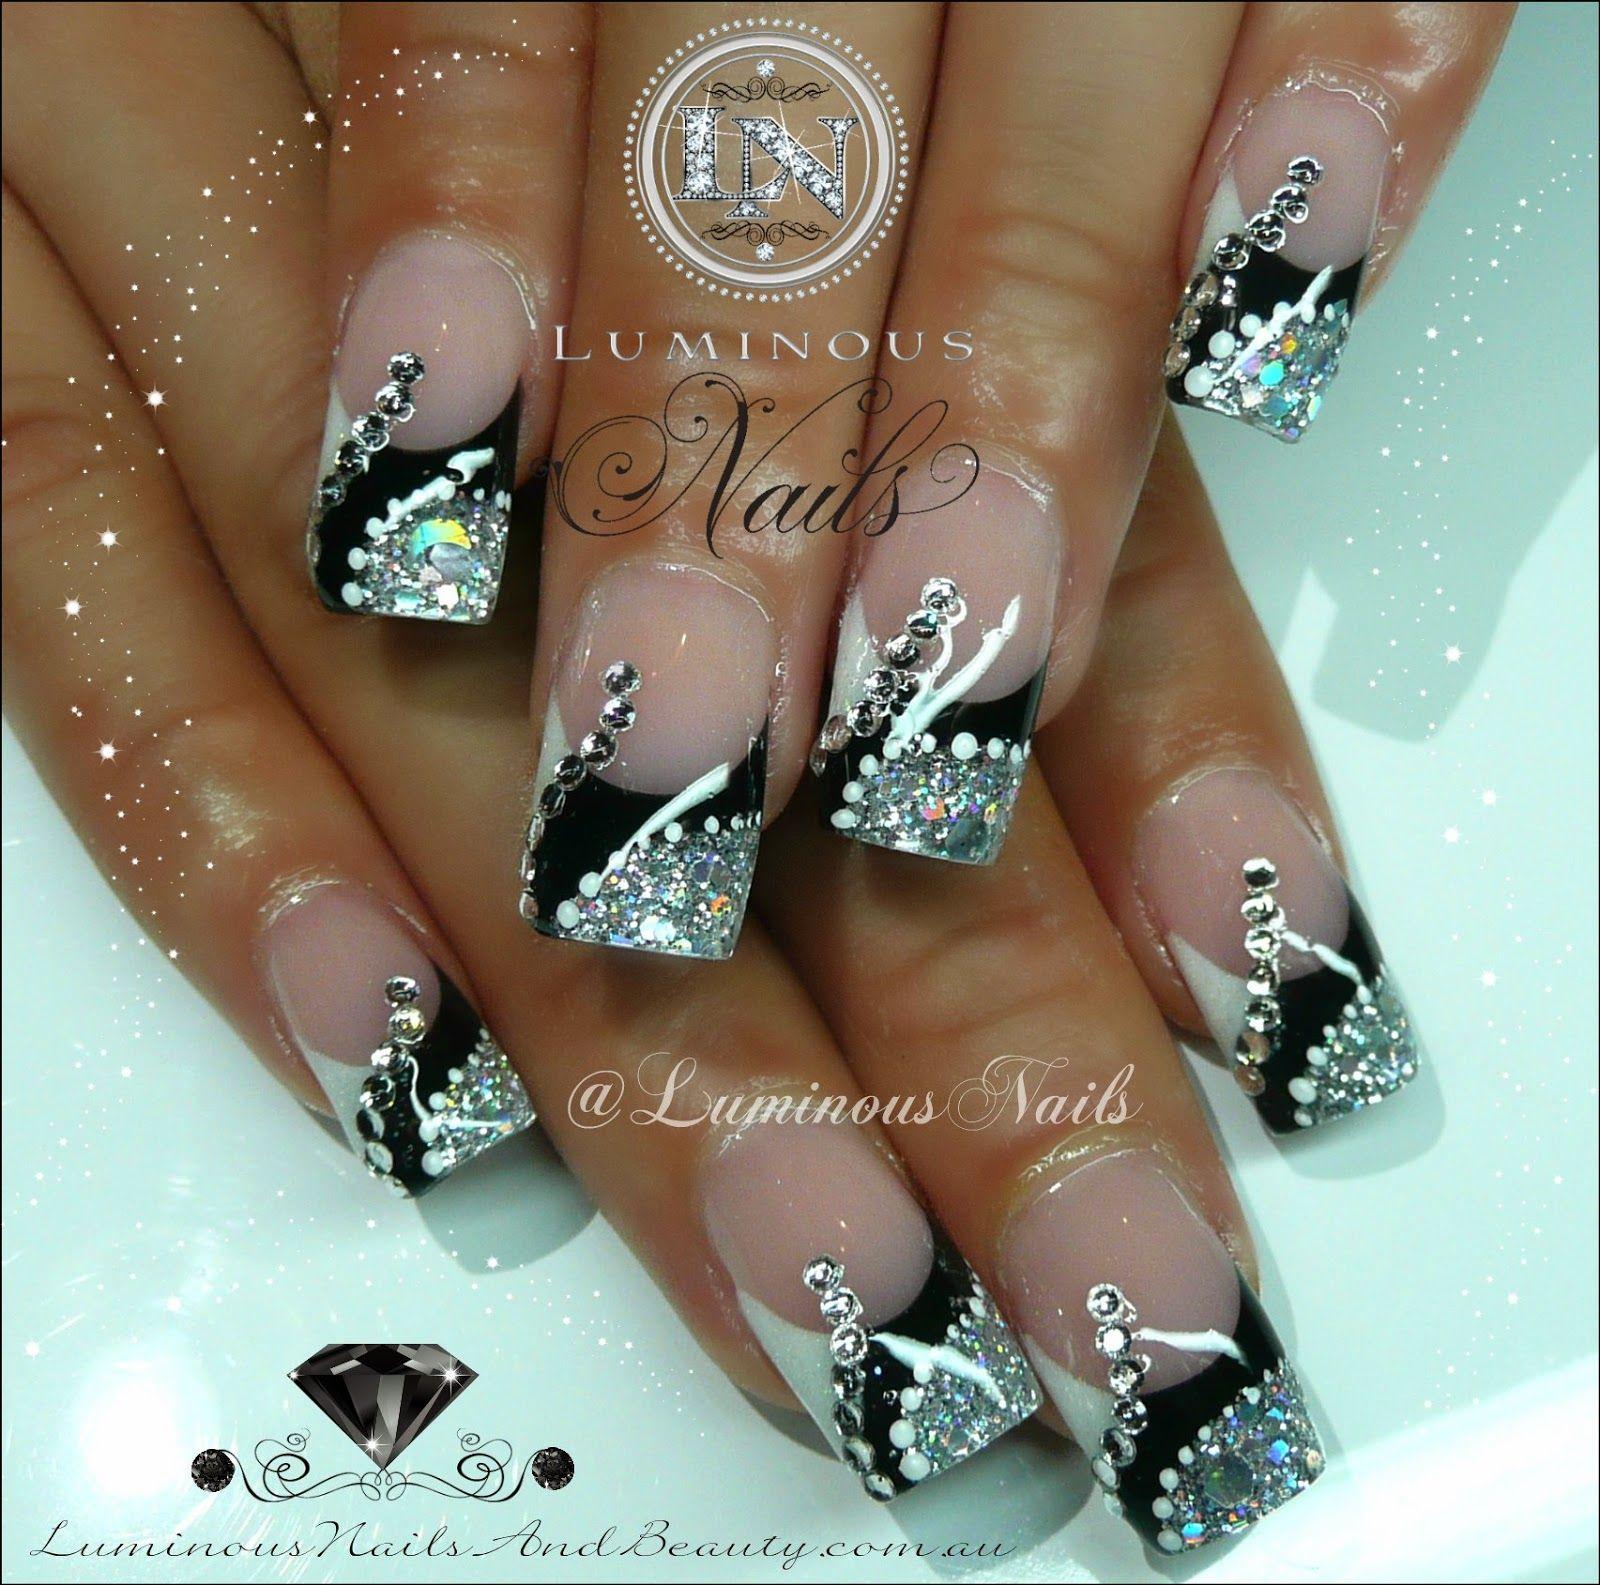 Black Silver White Nails With Bling Silver Nail Designs Luminous Nails Glitter Nail Art